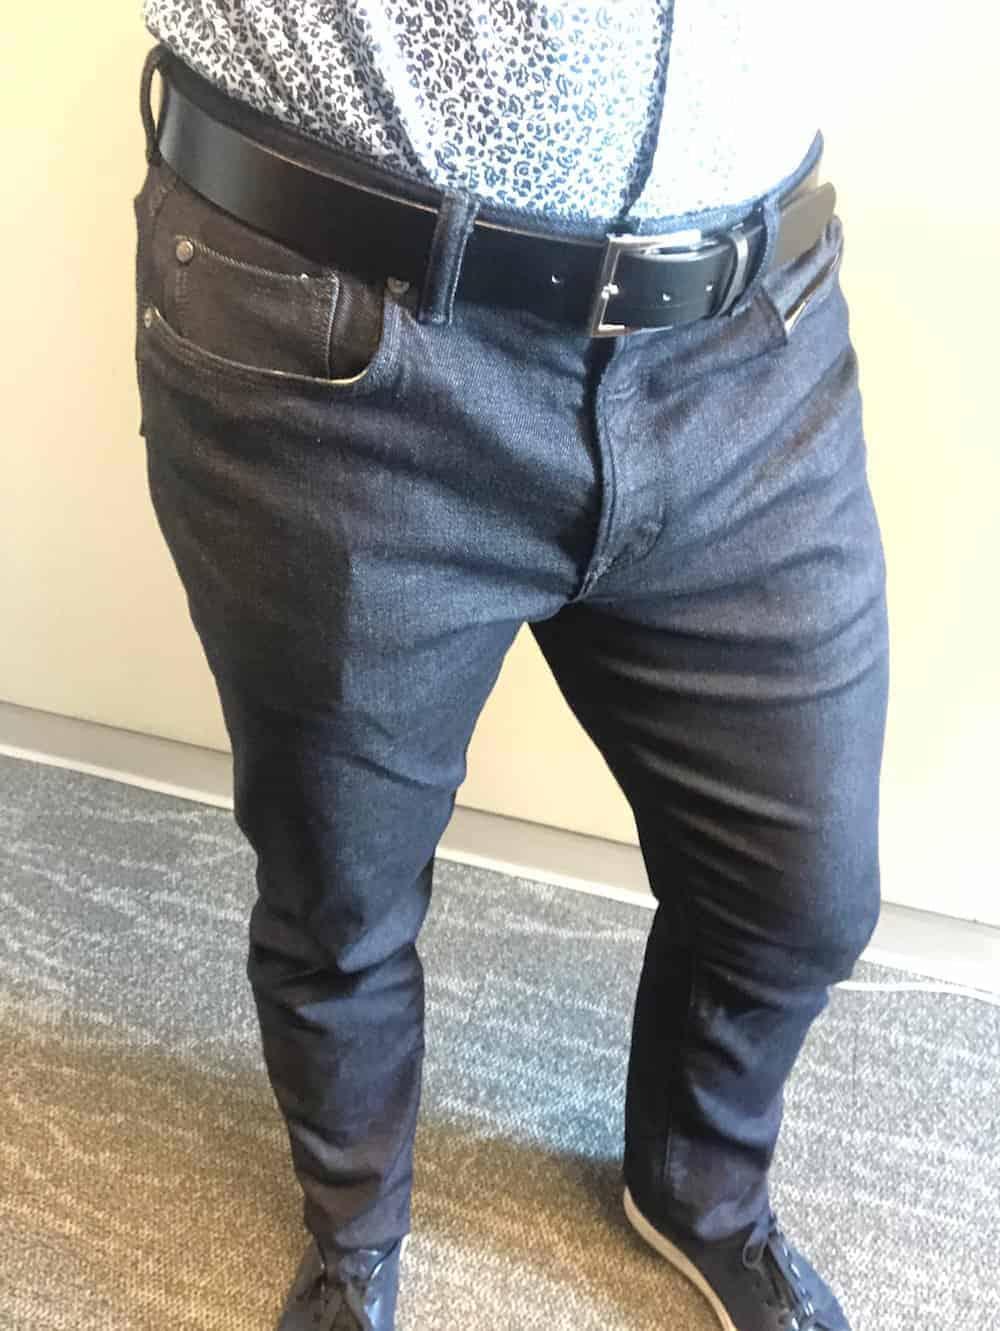 Full length front view of Traveler jeans for men by Banana Republic - shirt tucked.